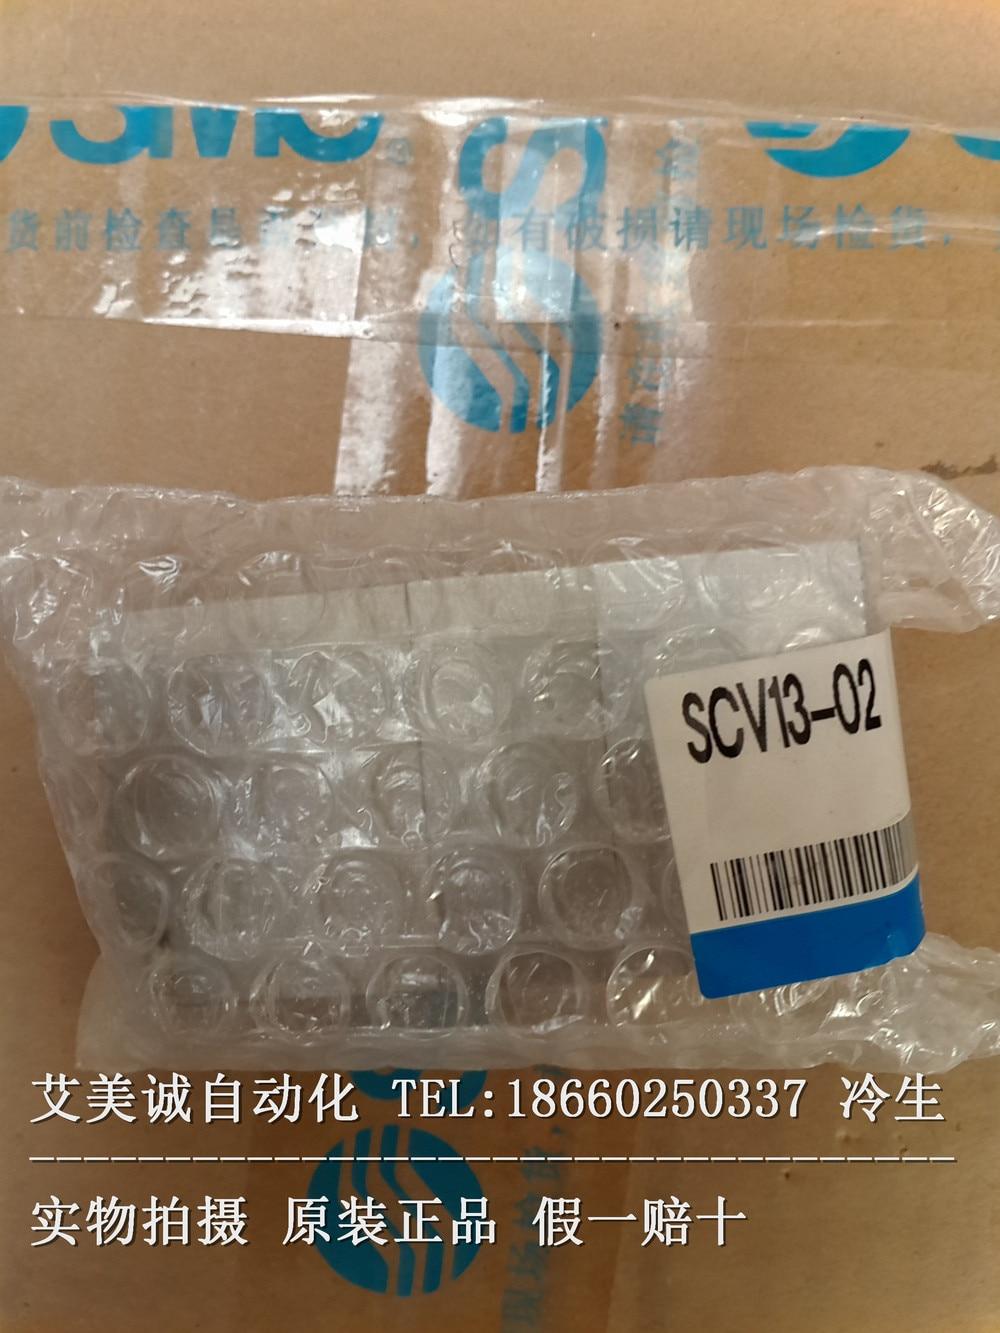 SMC pneumatic control valve SCV13-02 new original genuine scv valve suction control valve 8 98145455 0 8 98145453 0 for isuzu 4jk1 4jj1